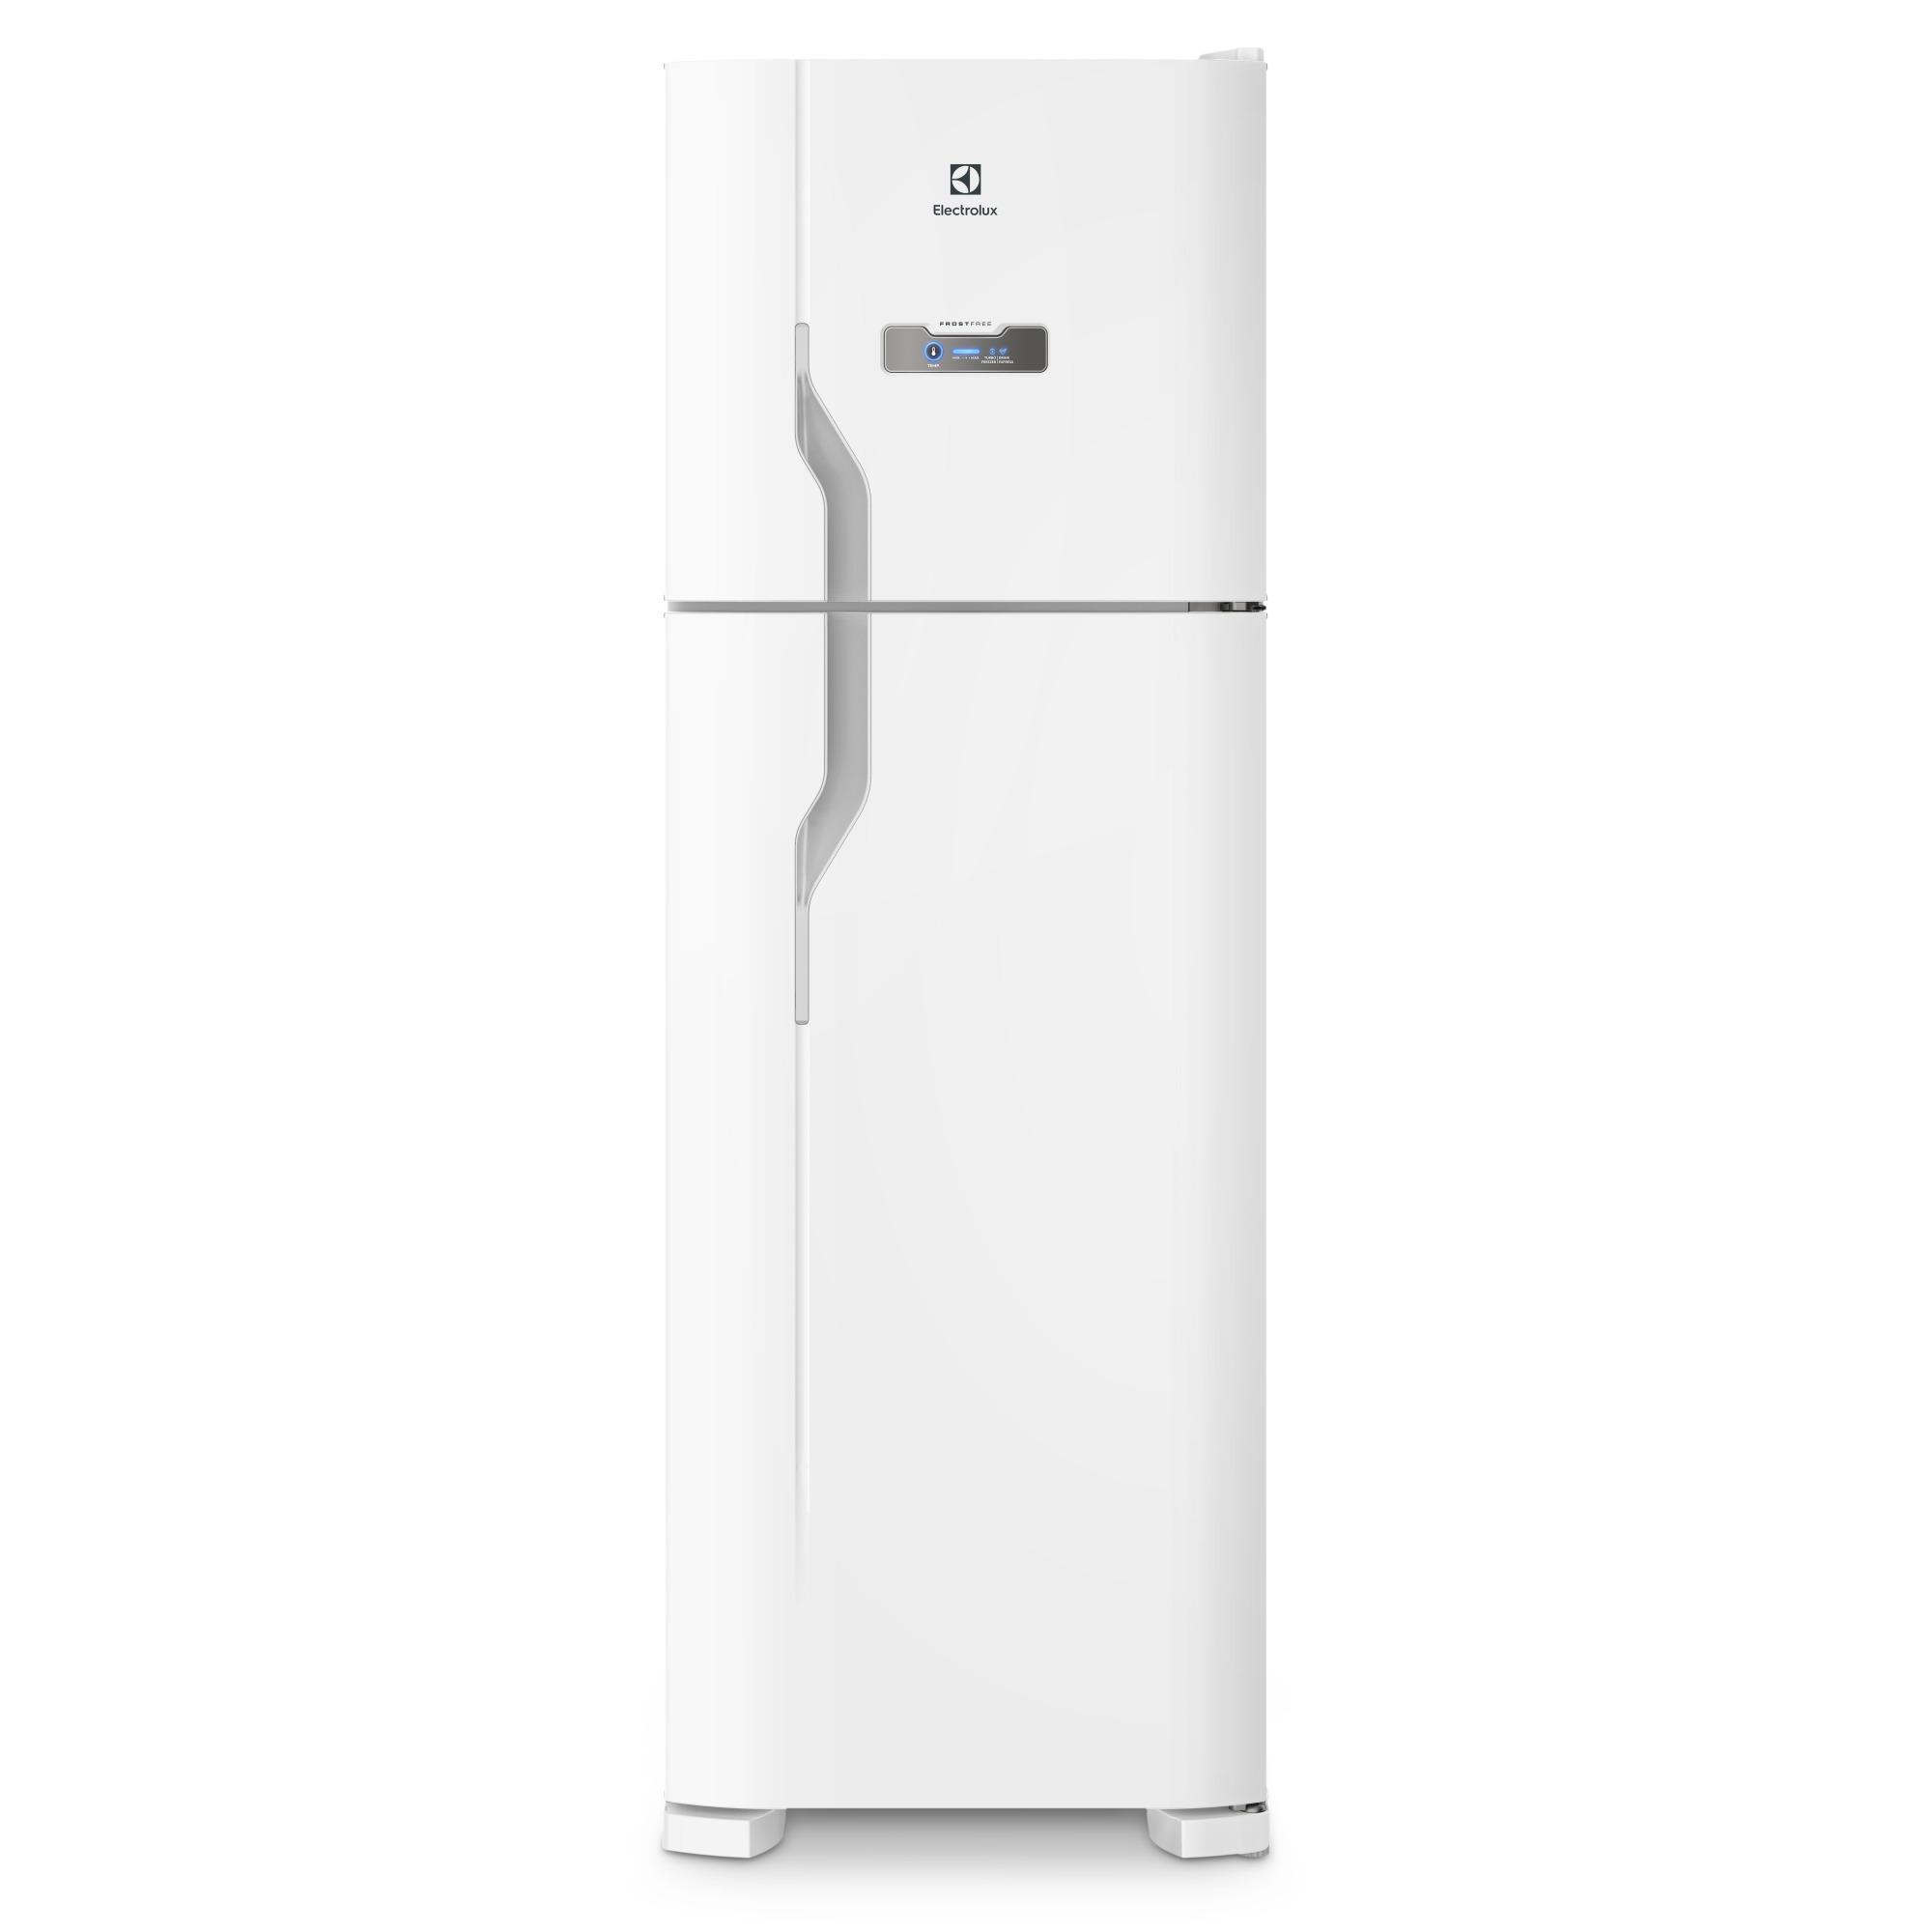 GeladeiraRefrigerador Electrolux Frost Free Duplex 371L Branco 127V - Painel Touch DFN41